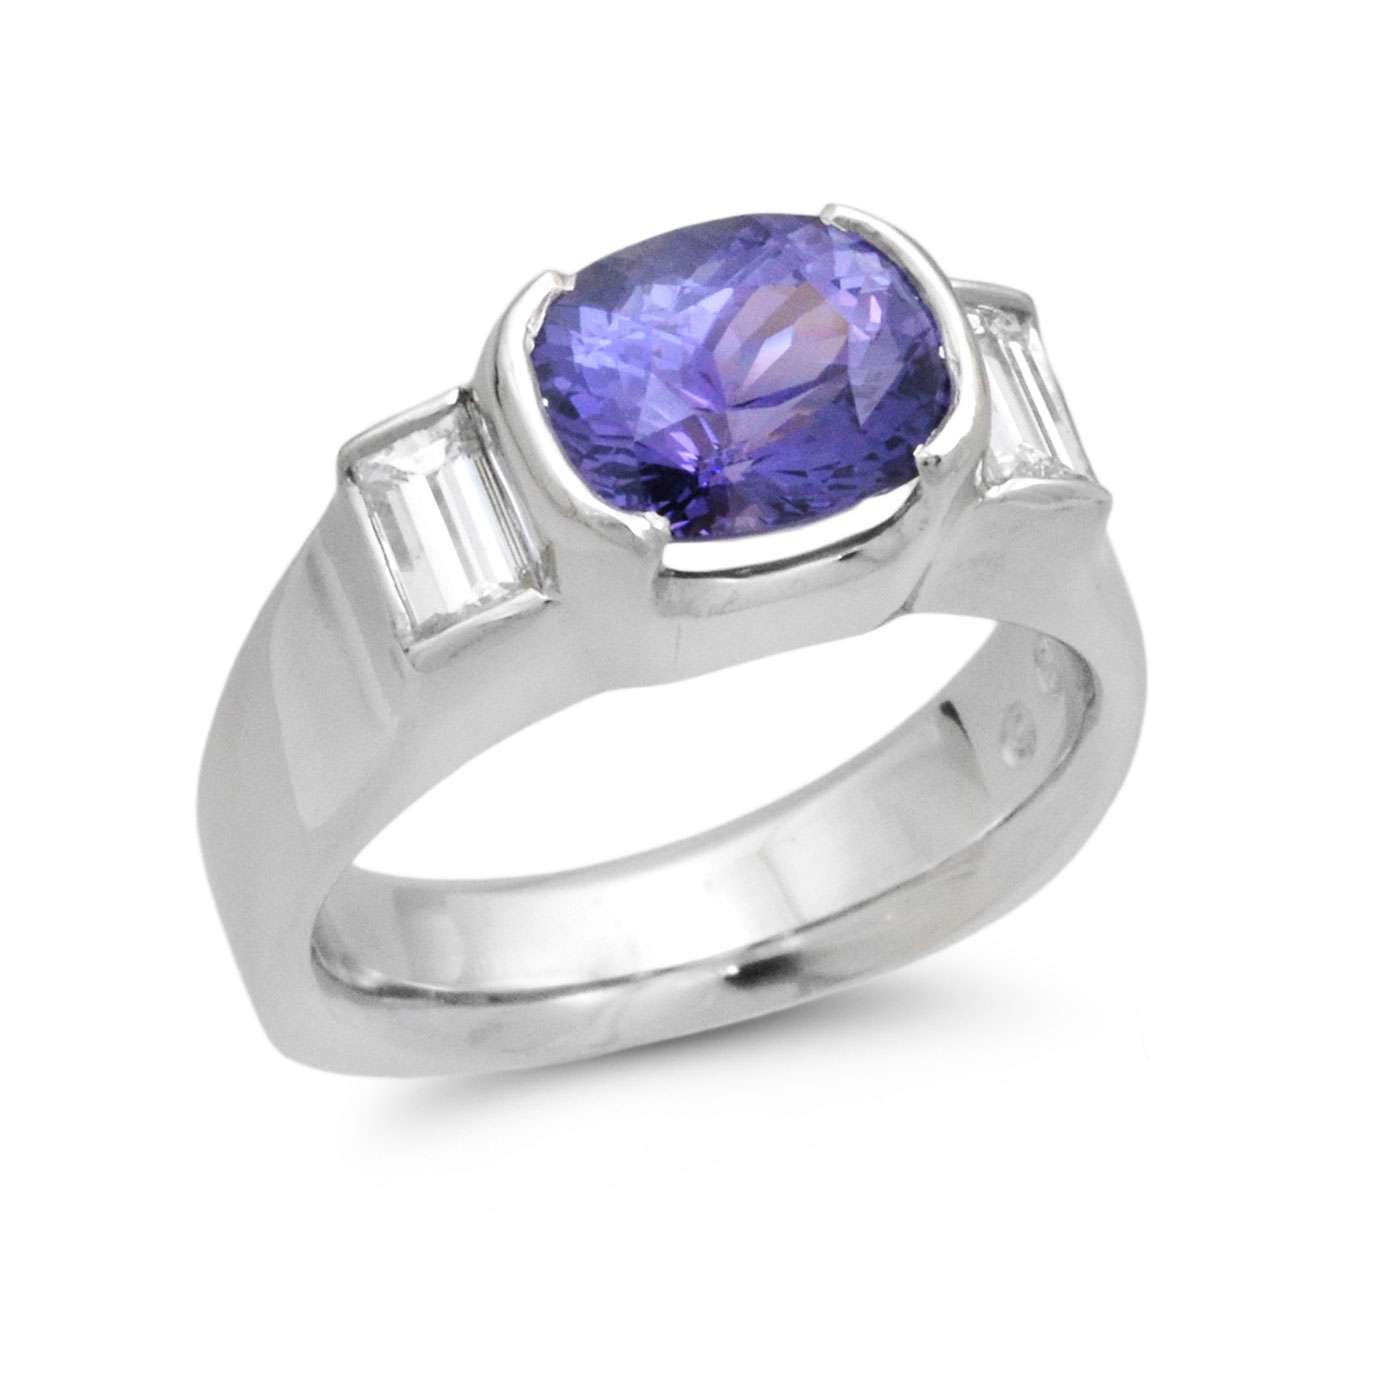 C6601 Oval Purple Sapphire Ring